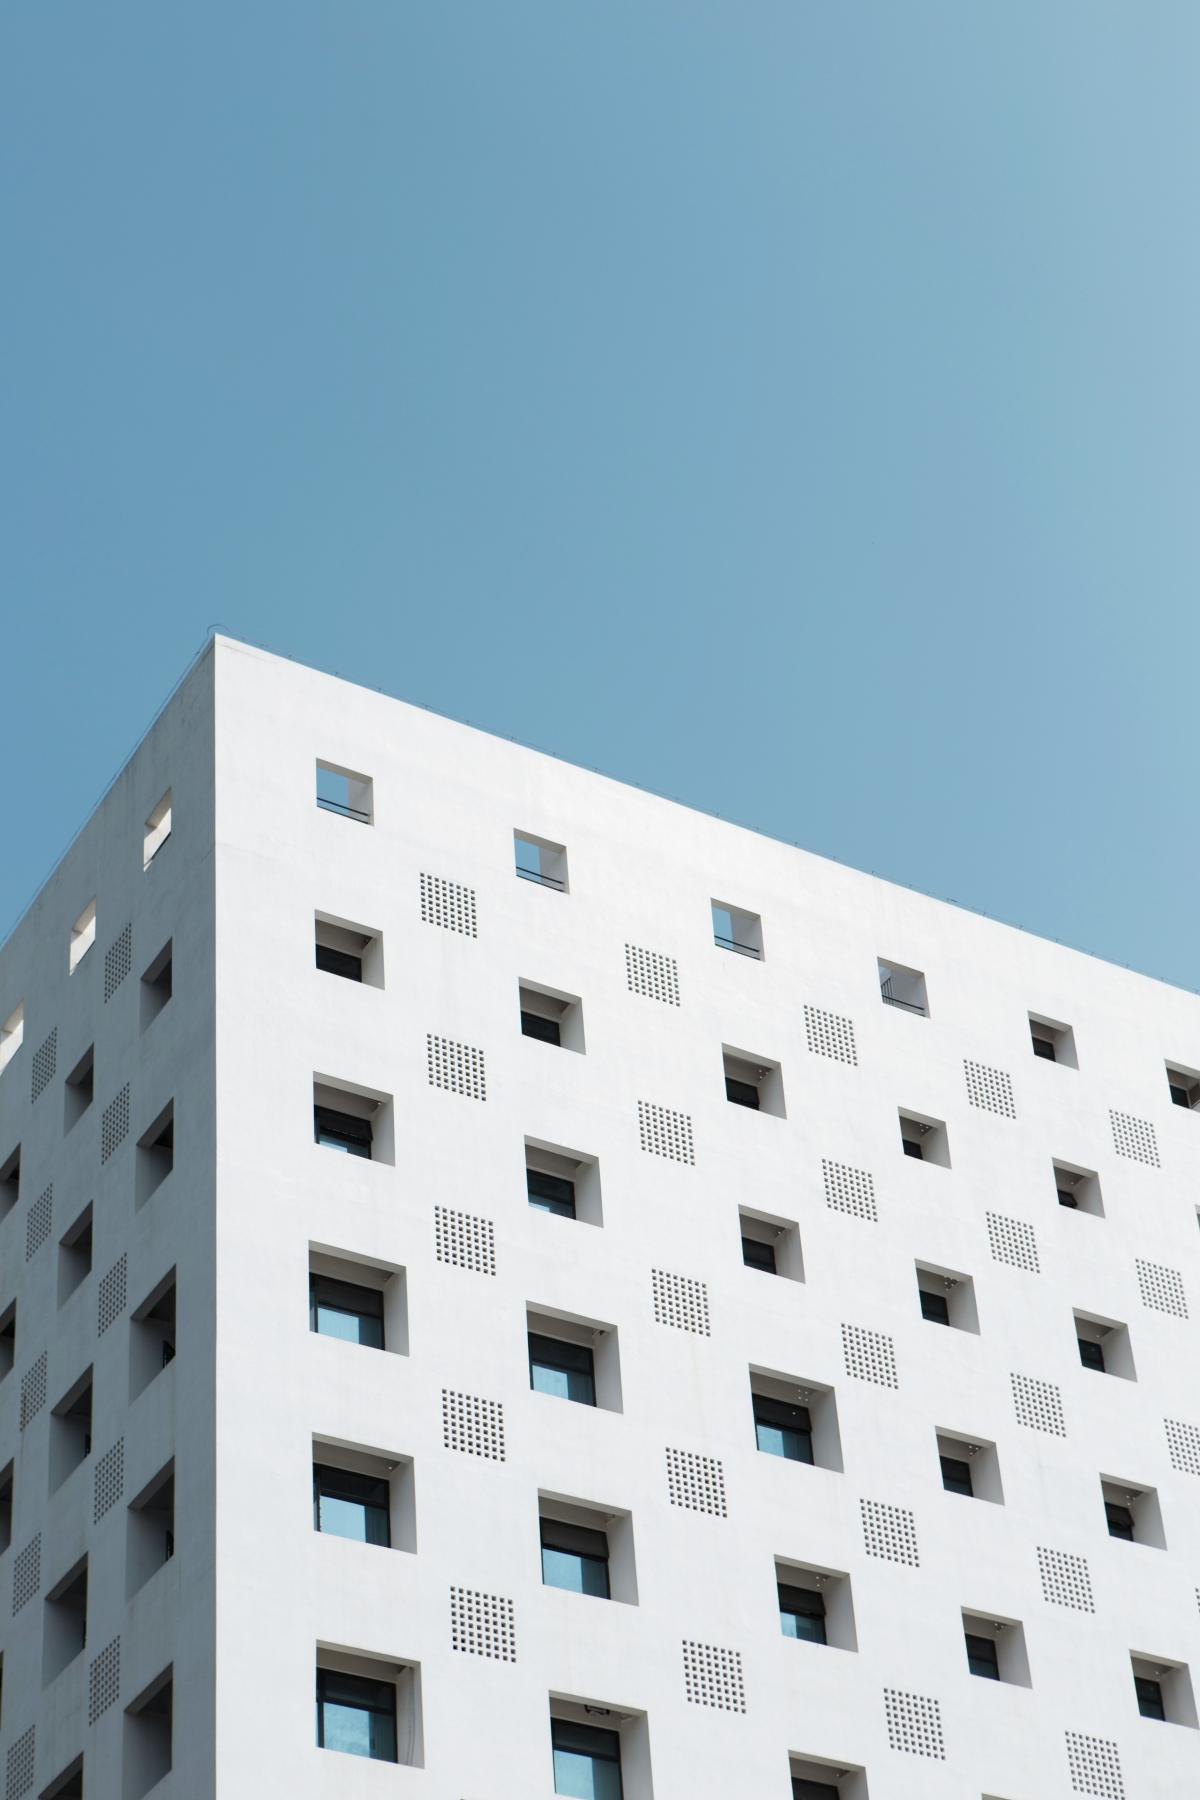 Architecture Modern Building #426251